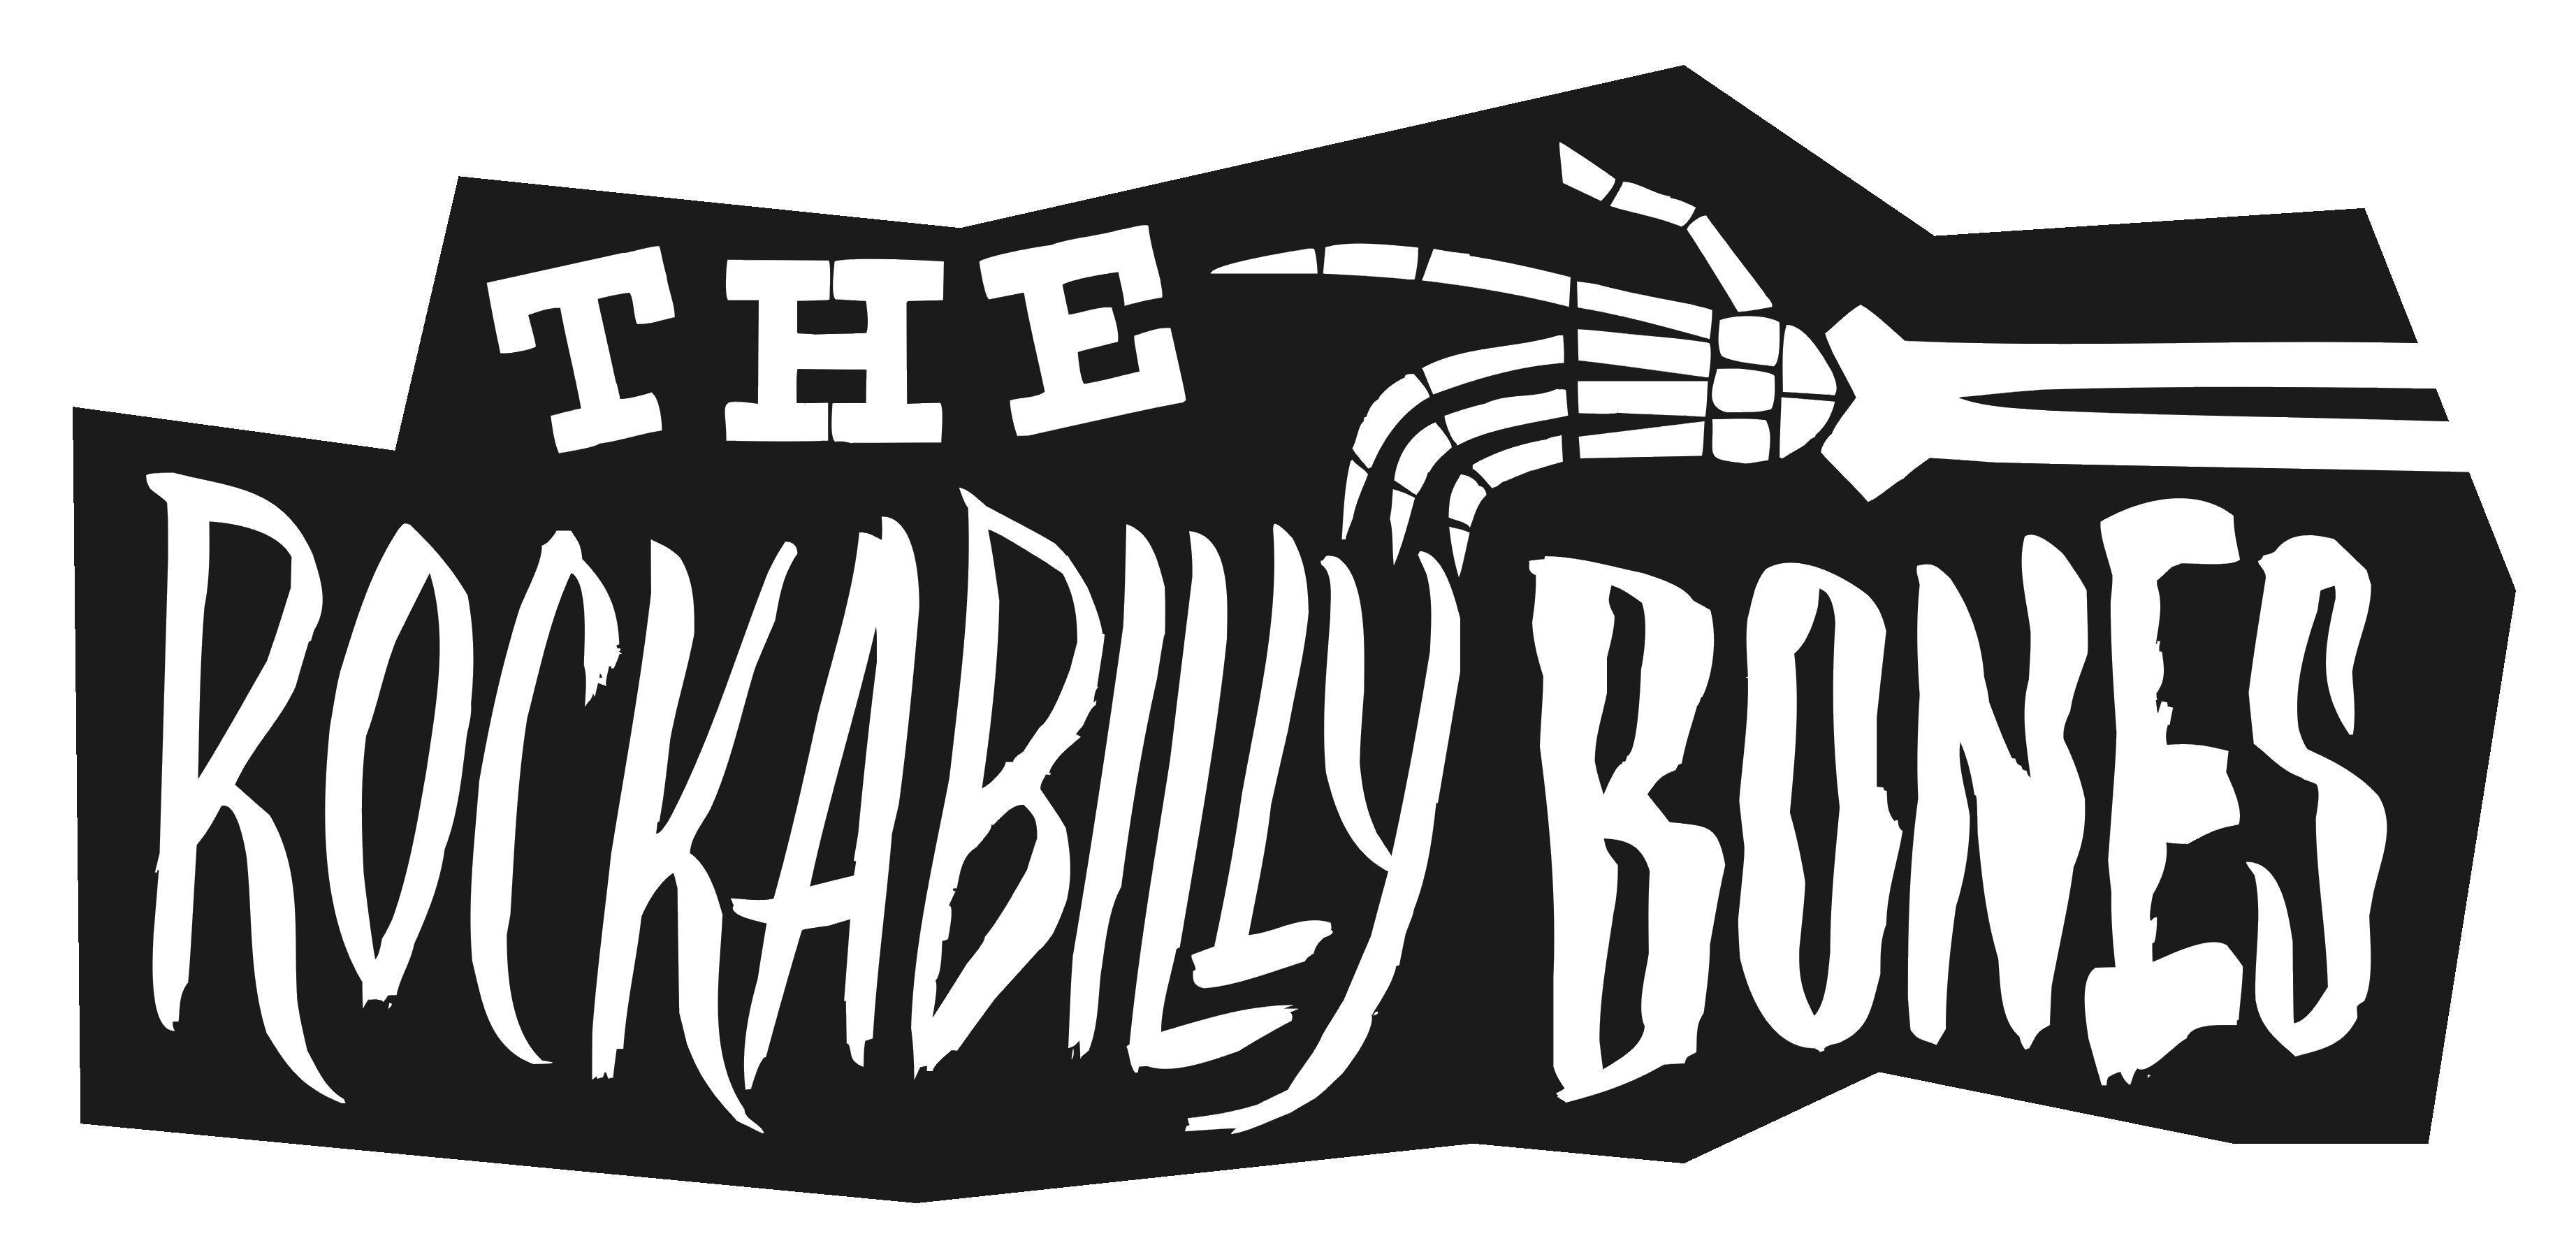 The Rockabilly Bones Logo